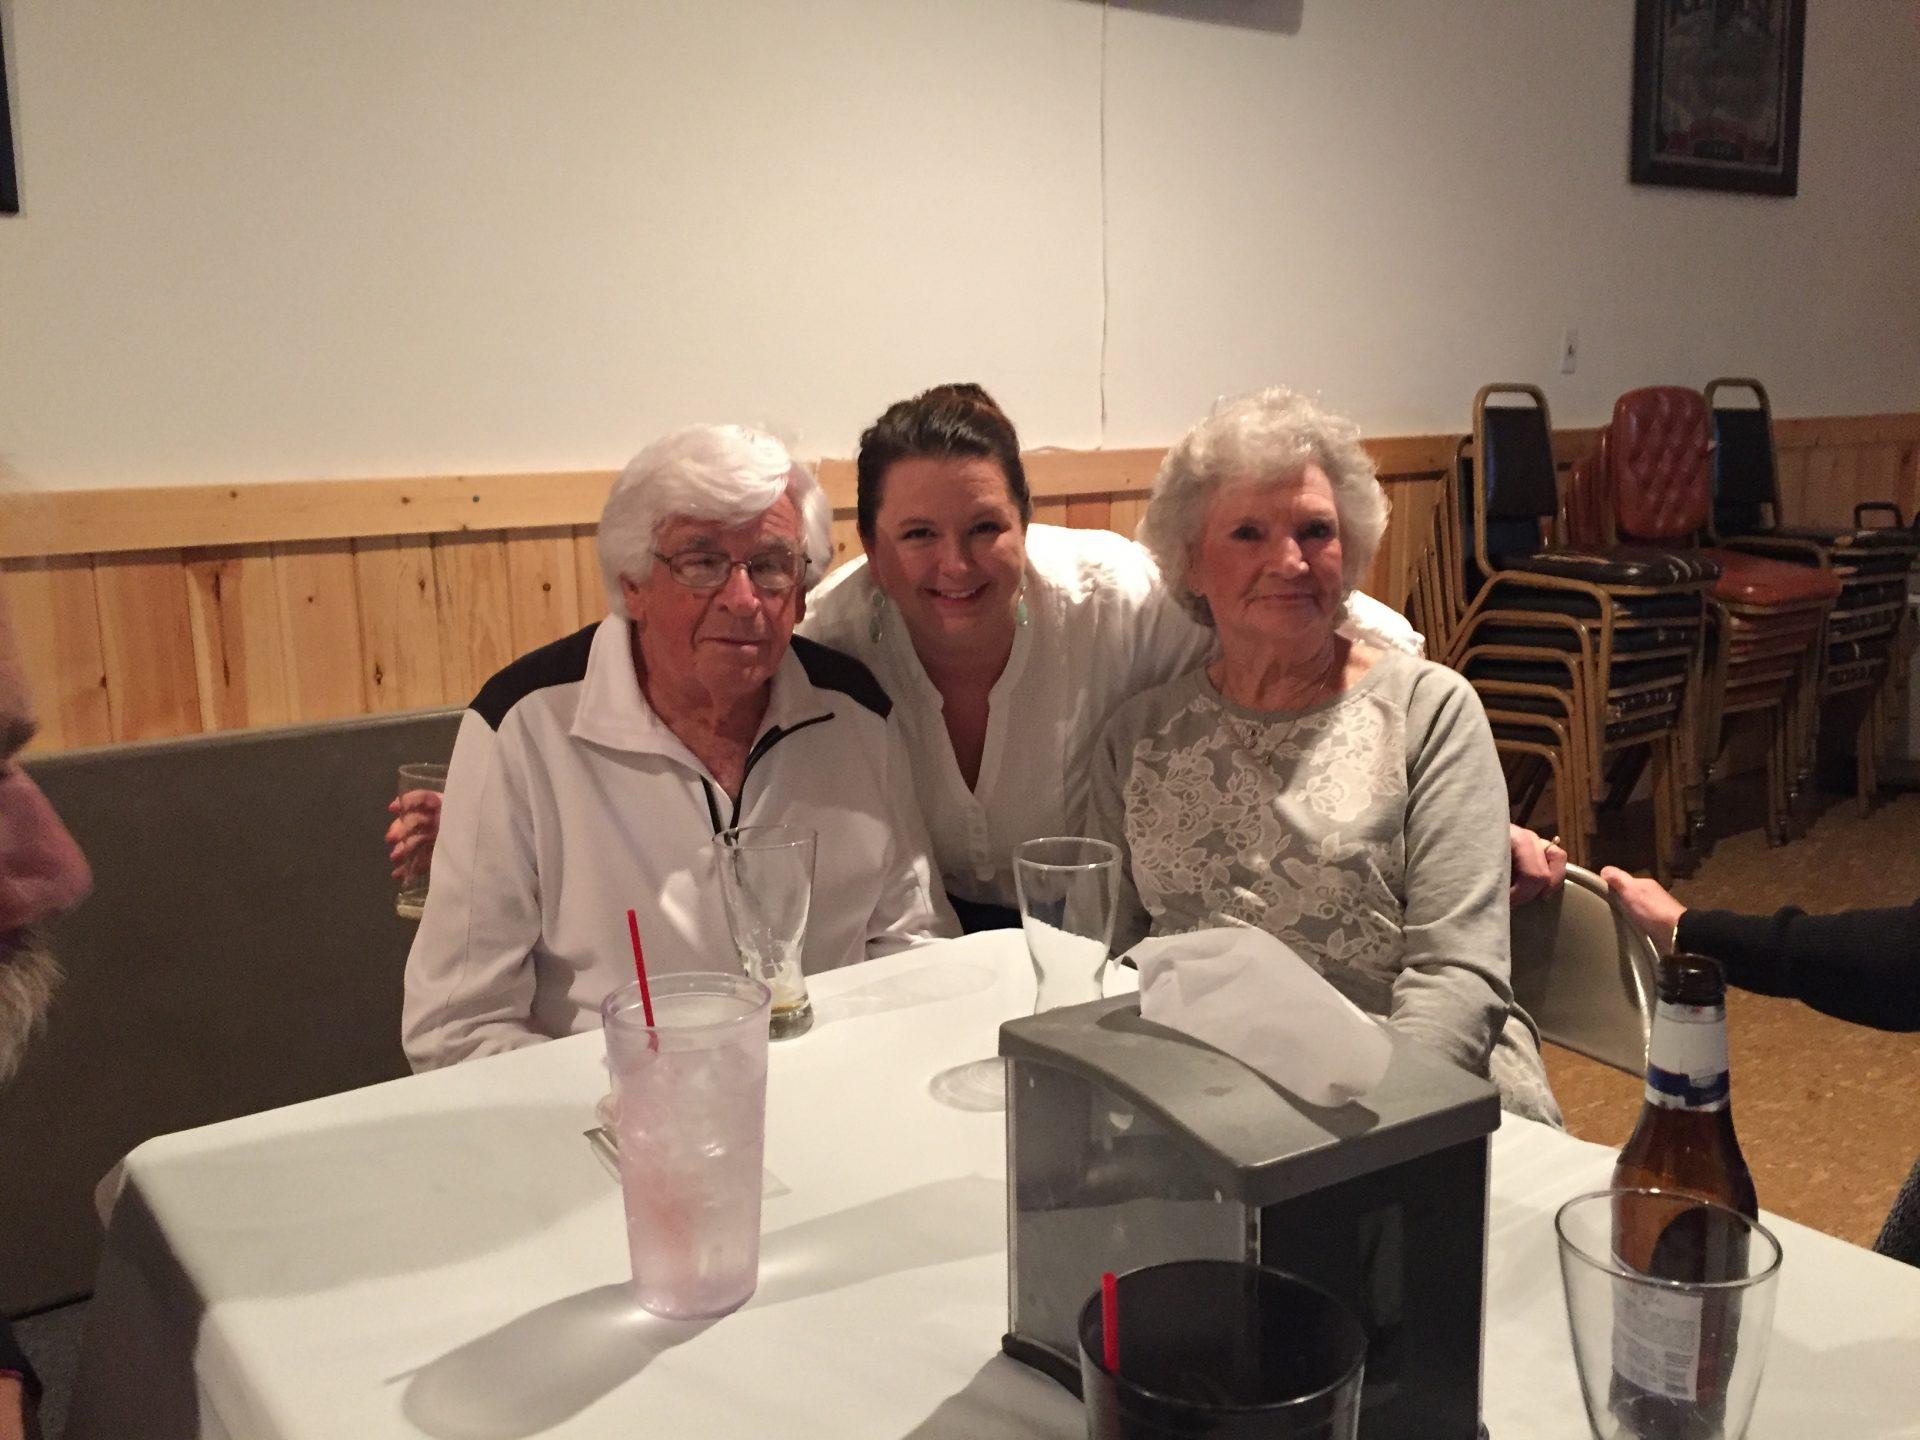 Candice, Granny, and Pop